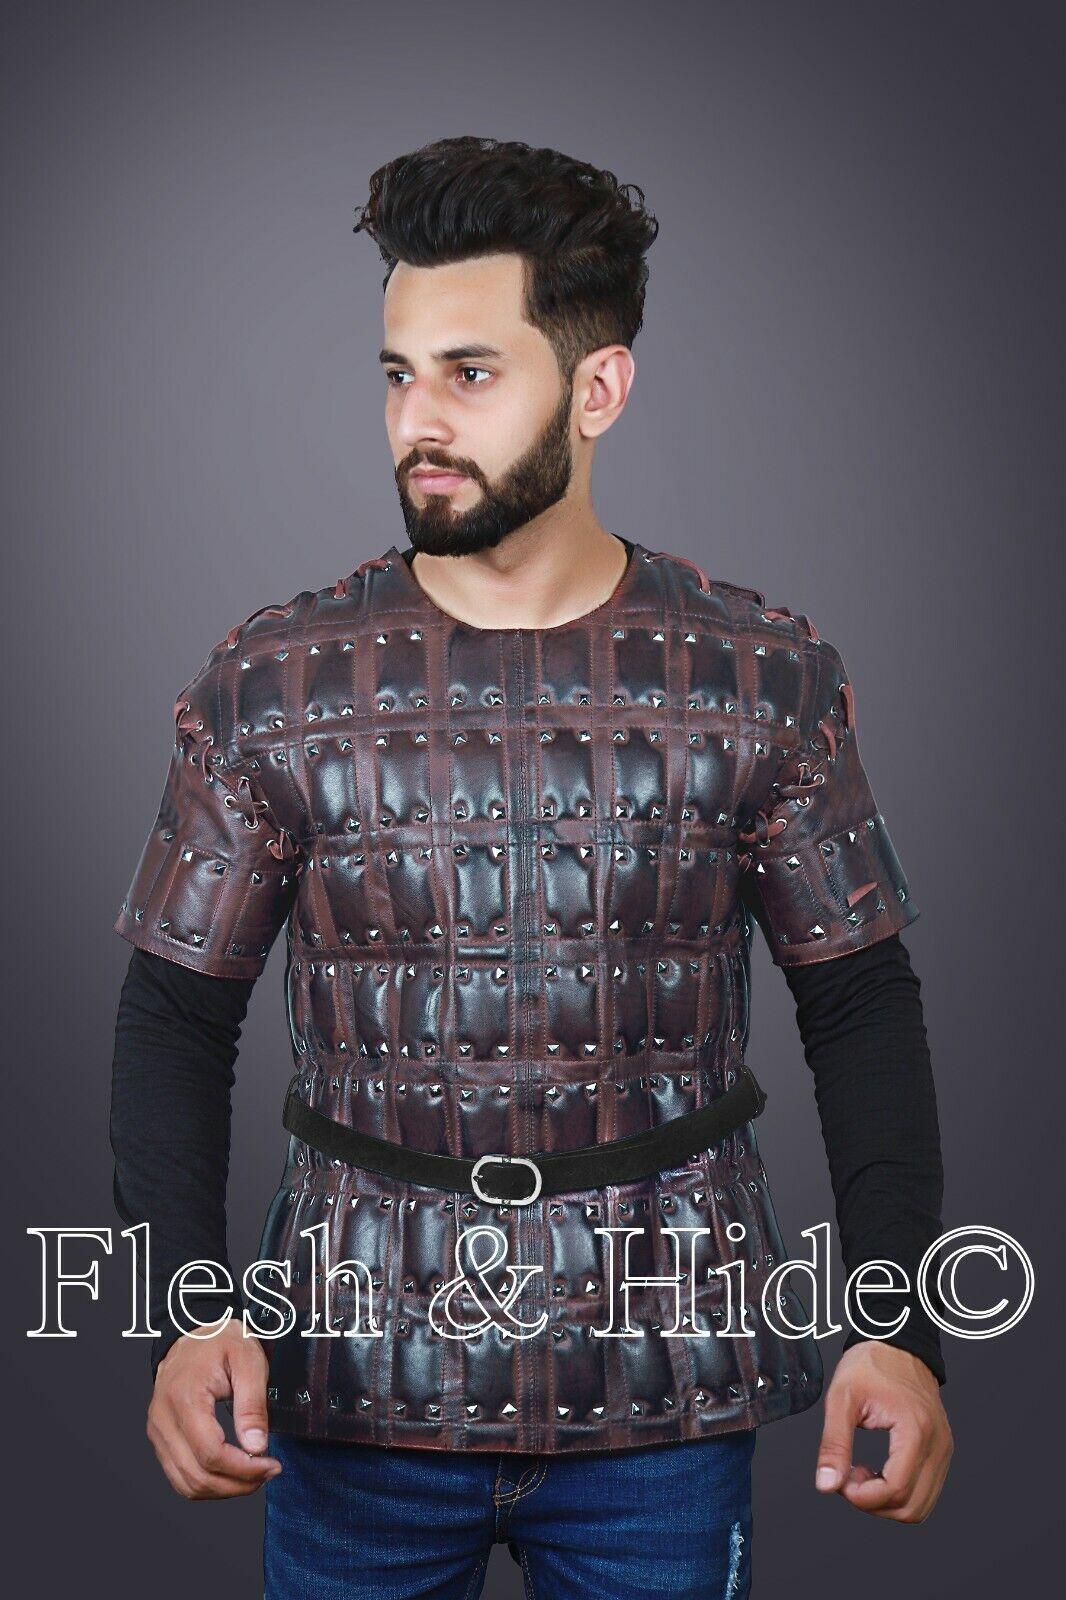 Game of Thrones Podrick Payne Daniel Portman Costume